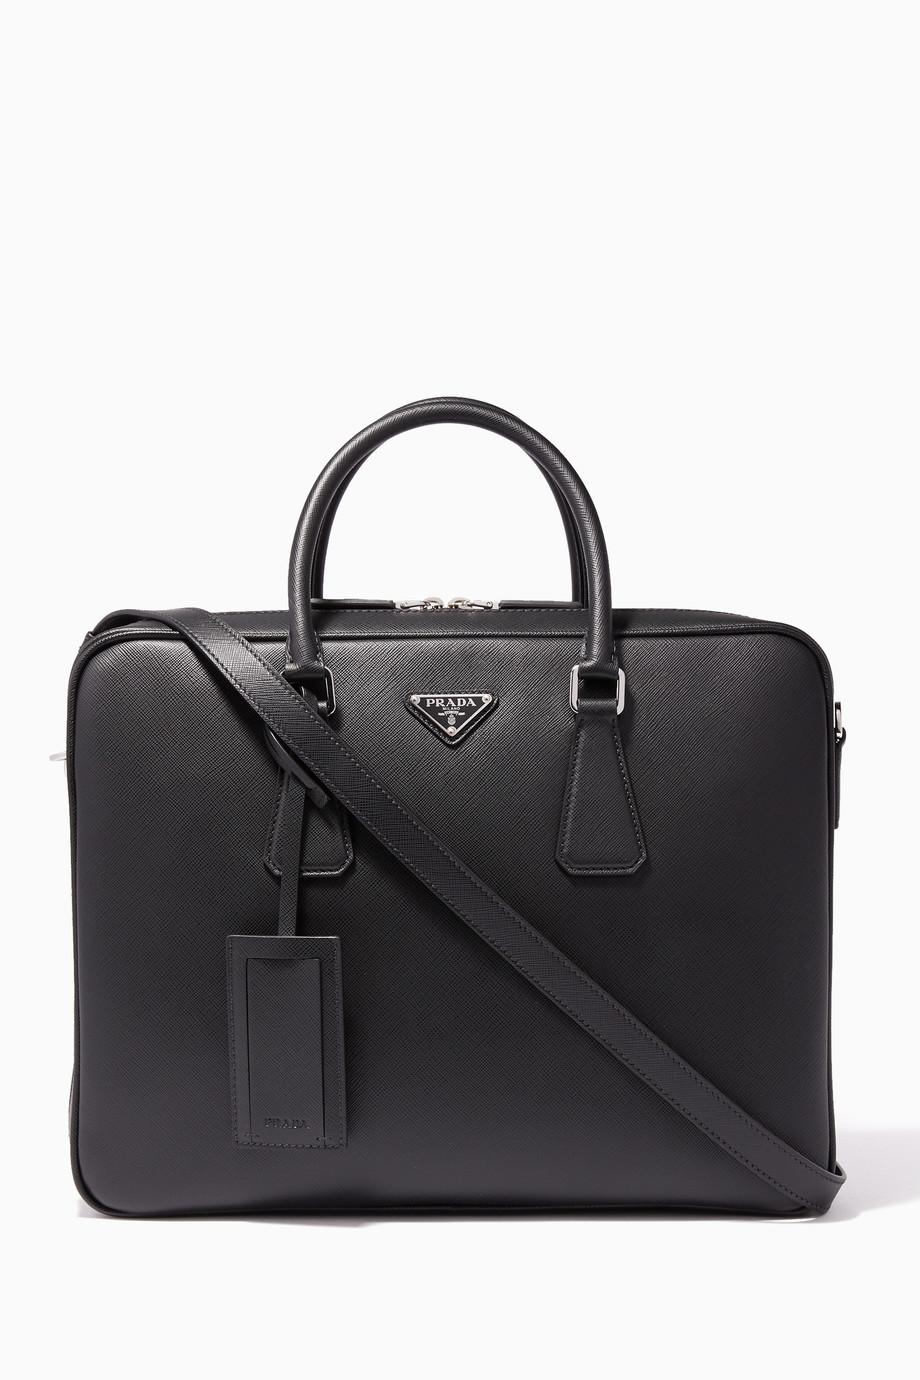 dd0ce73bdbf1 Shop Prada Black Black Saffiano Leather Briefcase for Men